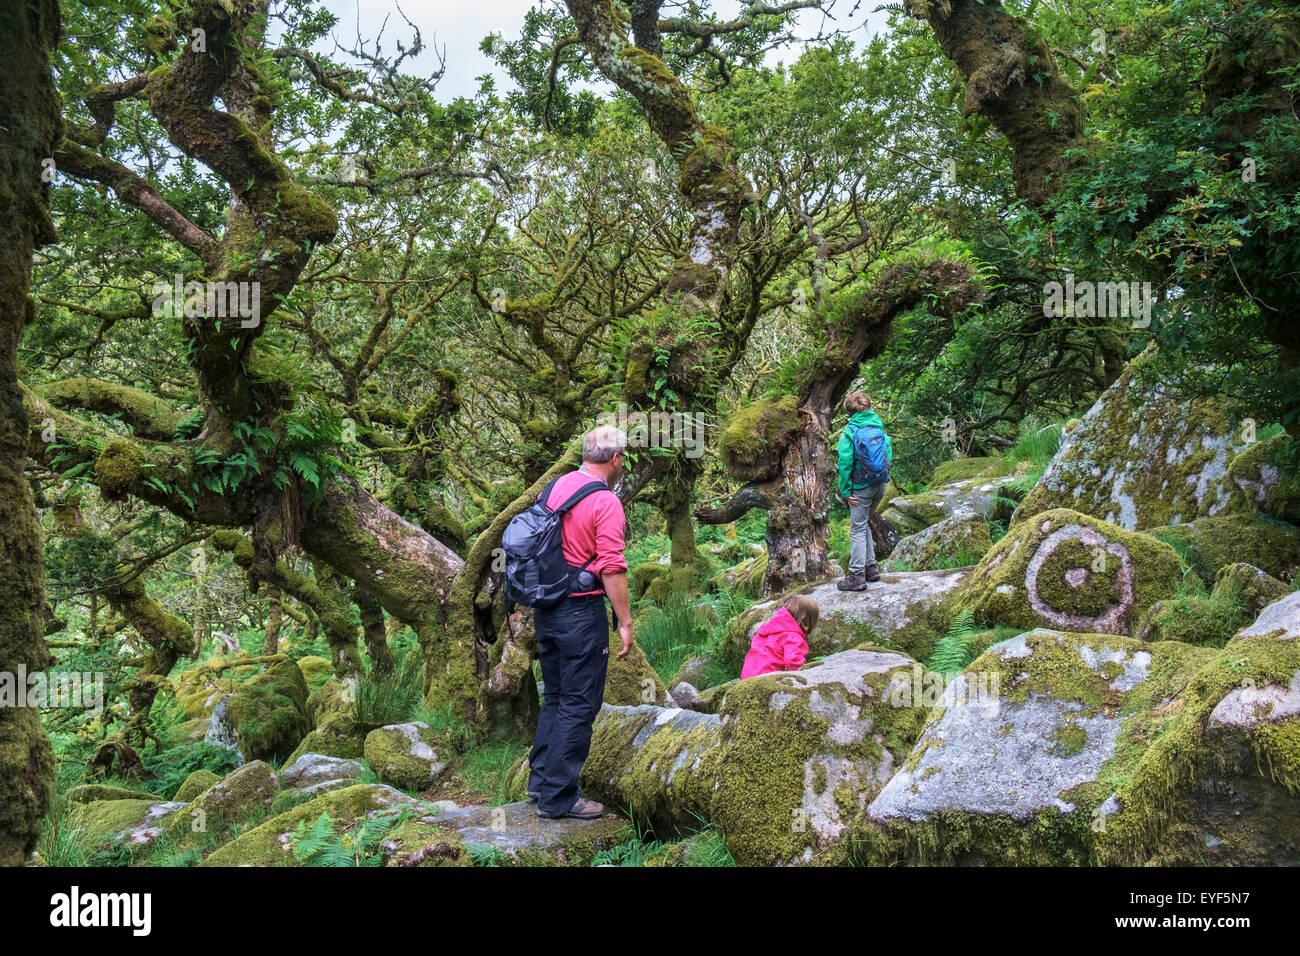 Una familia caminando en Wistman's Wood, un robledal de gran altitud (Quercus robur), cerca de dos puentes, Imagen De Stock